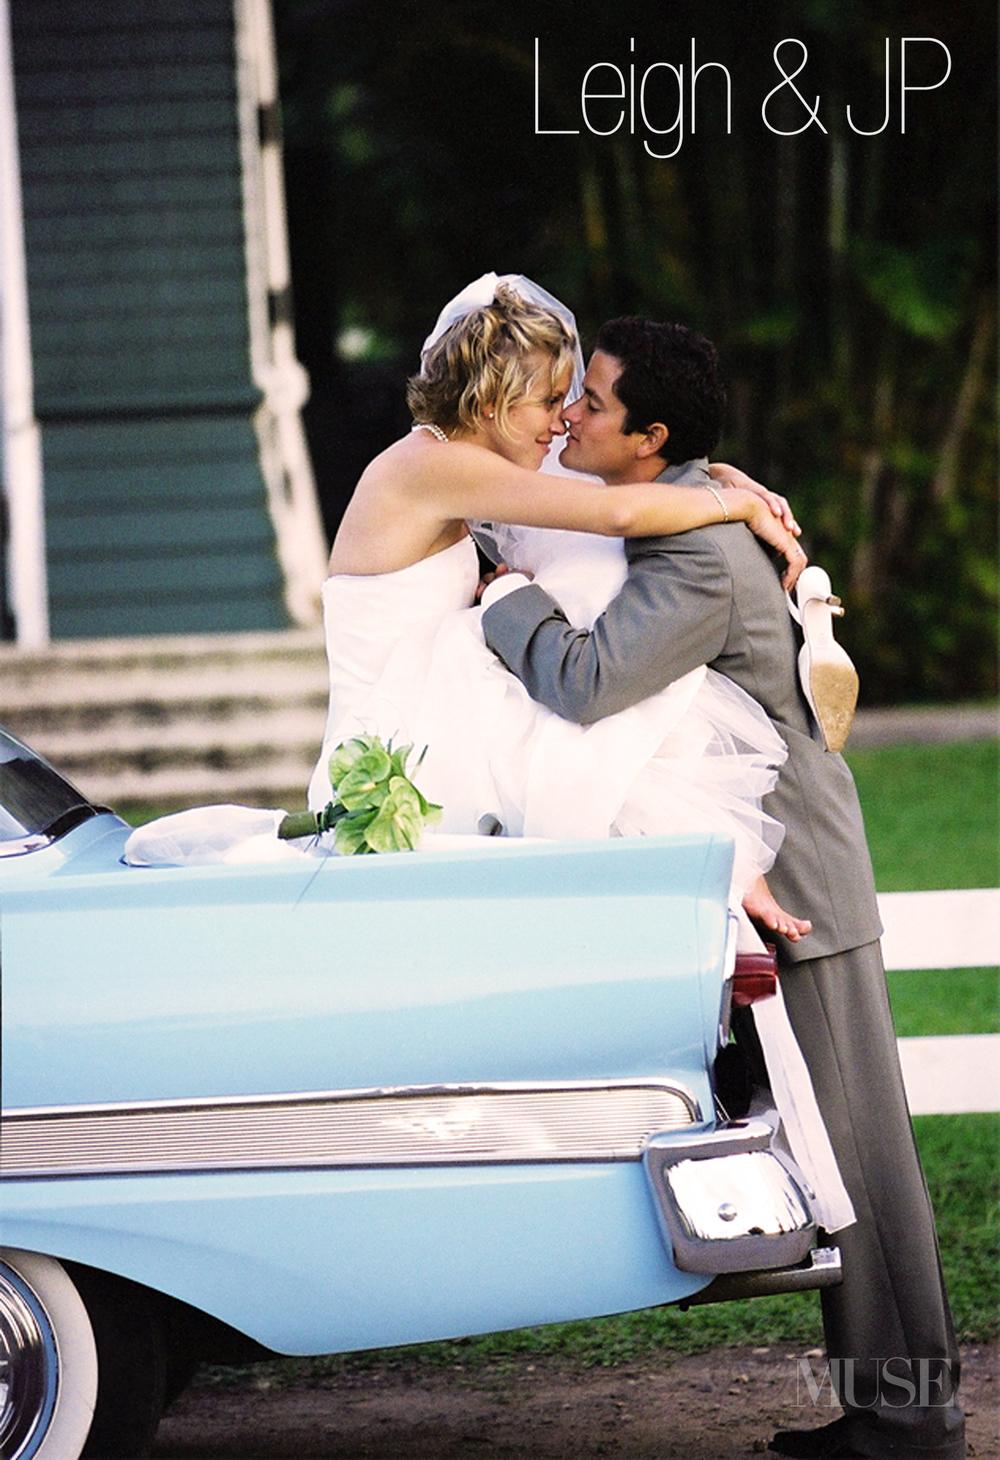 MUSE Bride Erick Rhodes Photography Hanalei Wedding